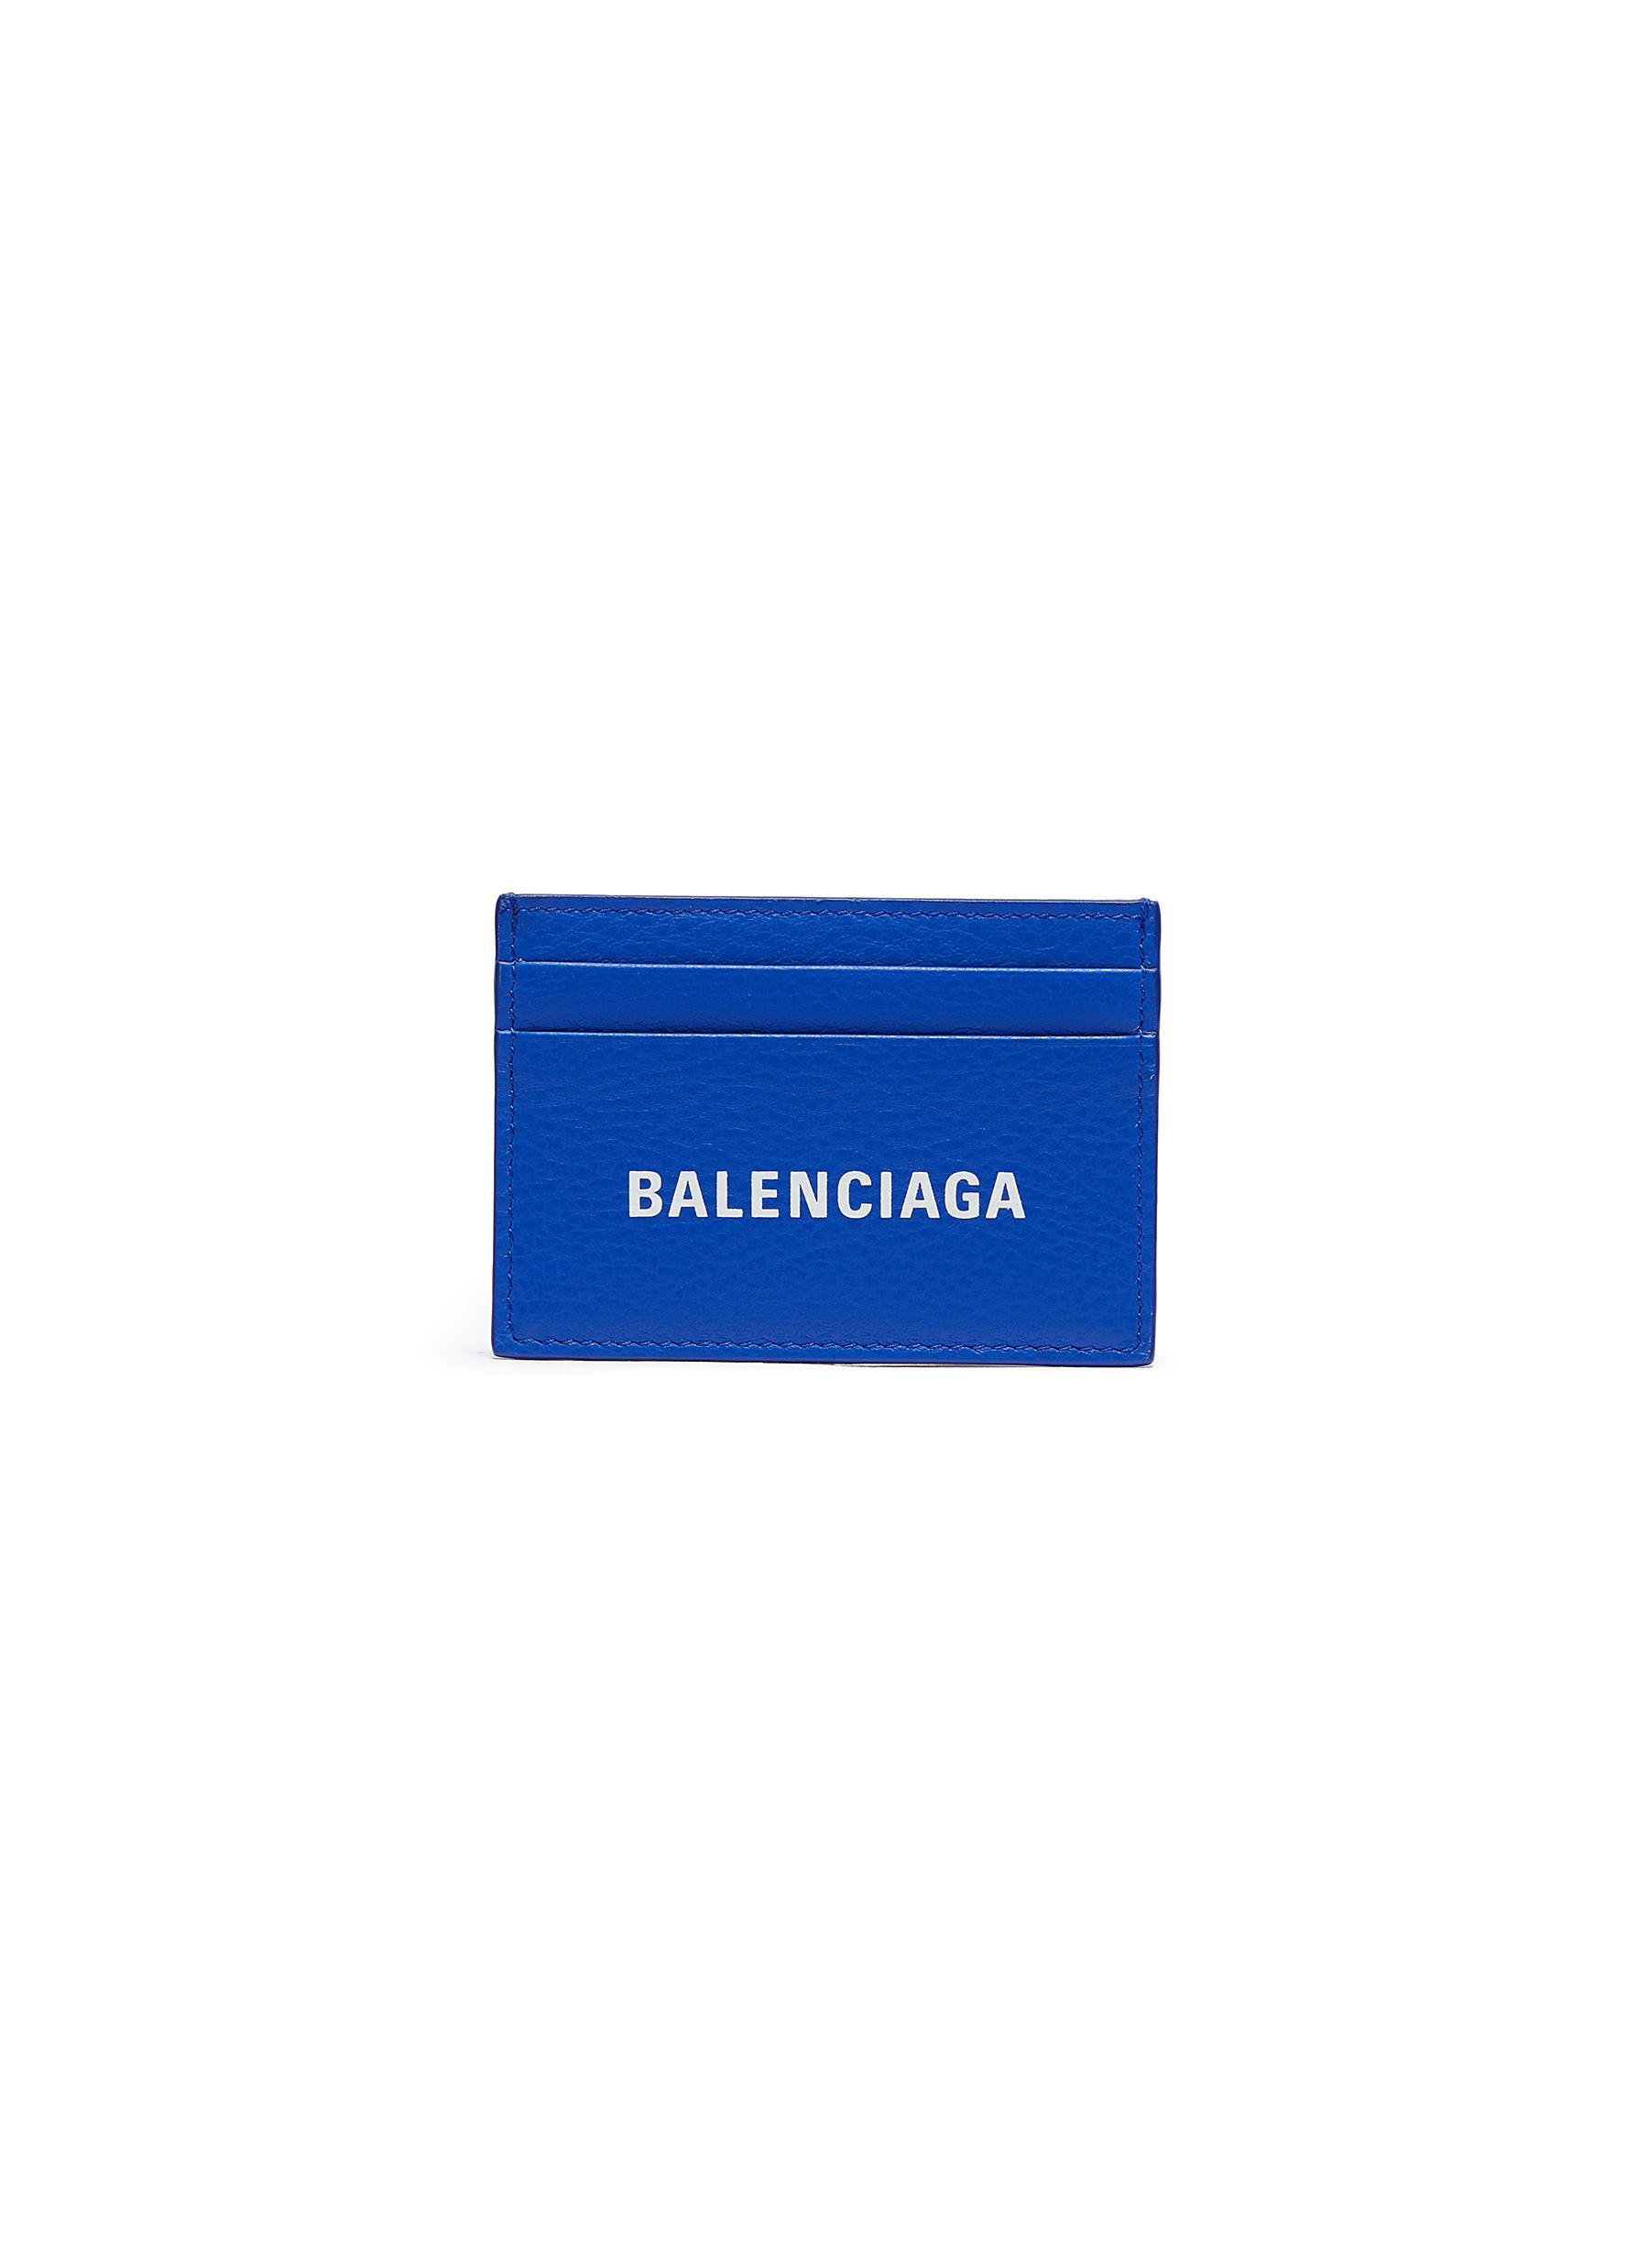 Balenciaga 'Everyday' Logo Print Leather Card Holder In Blue